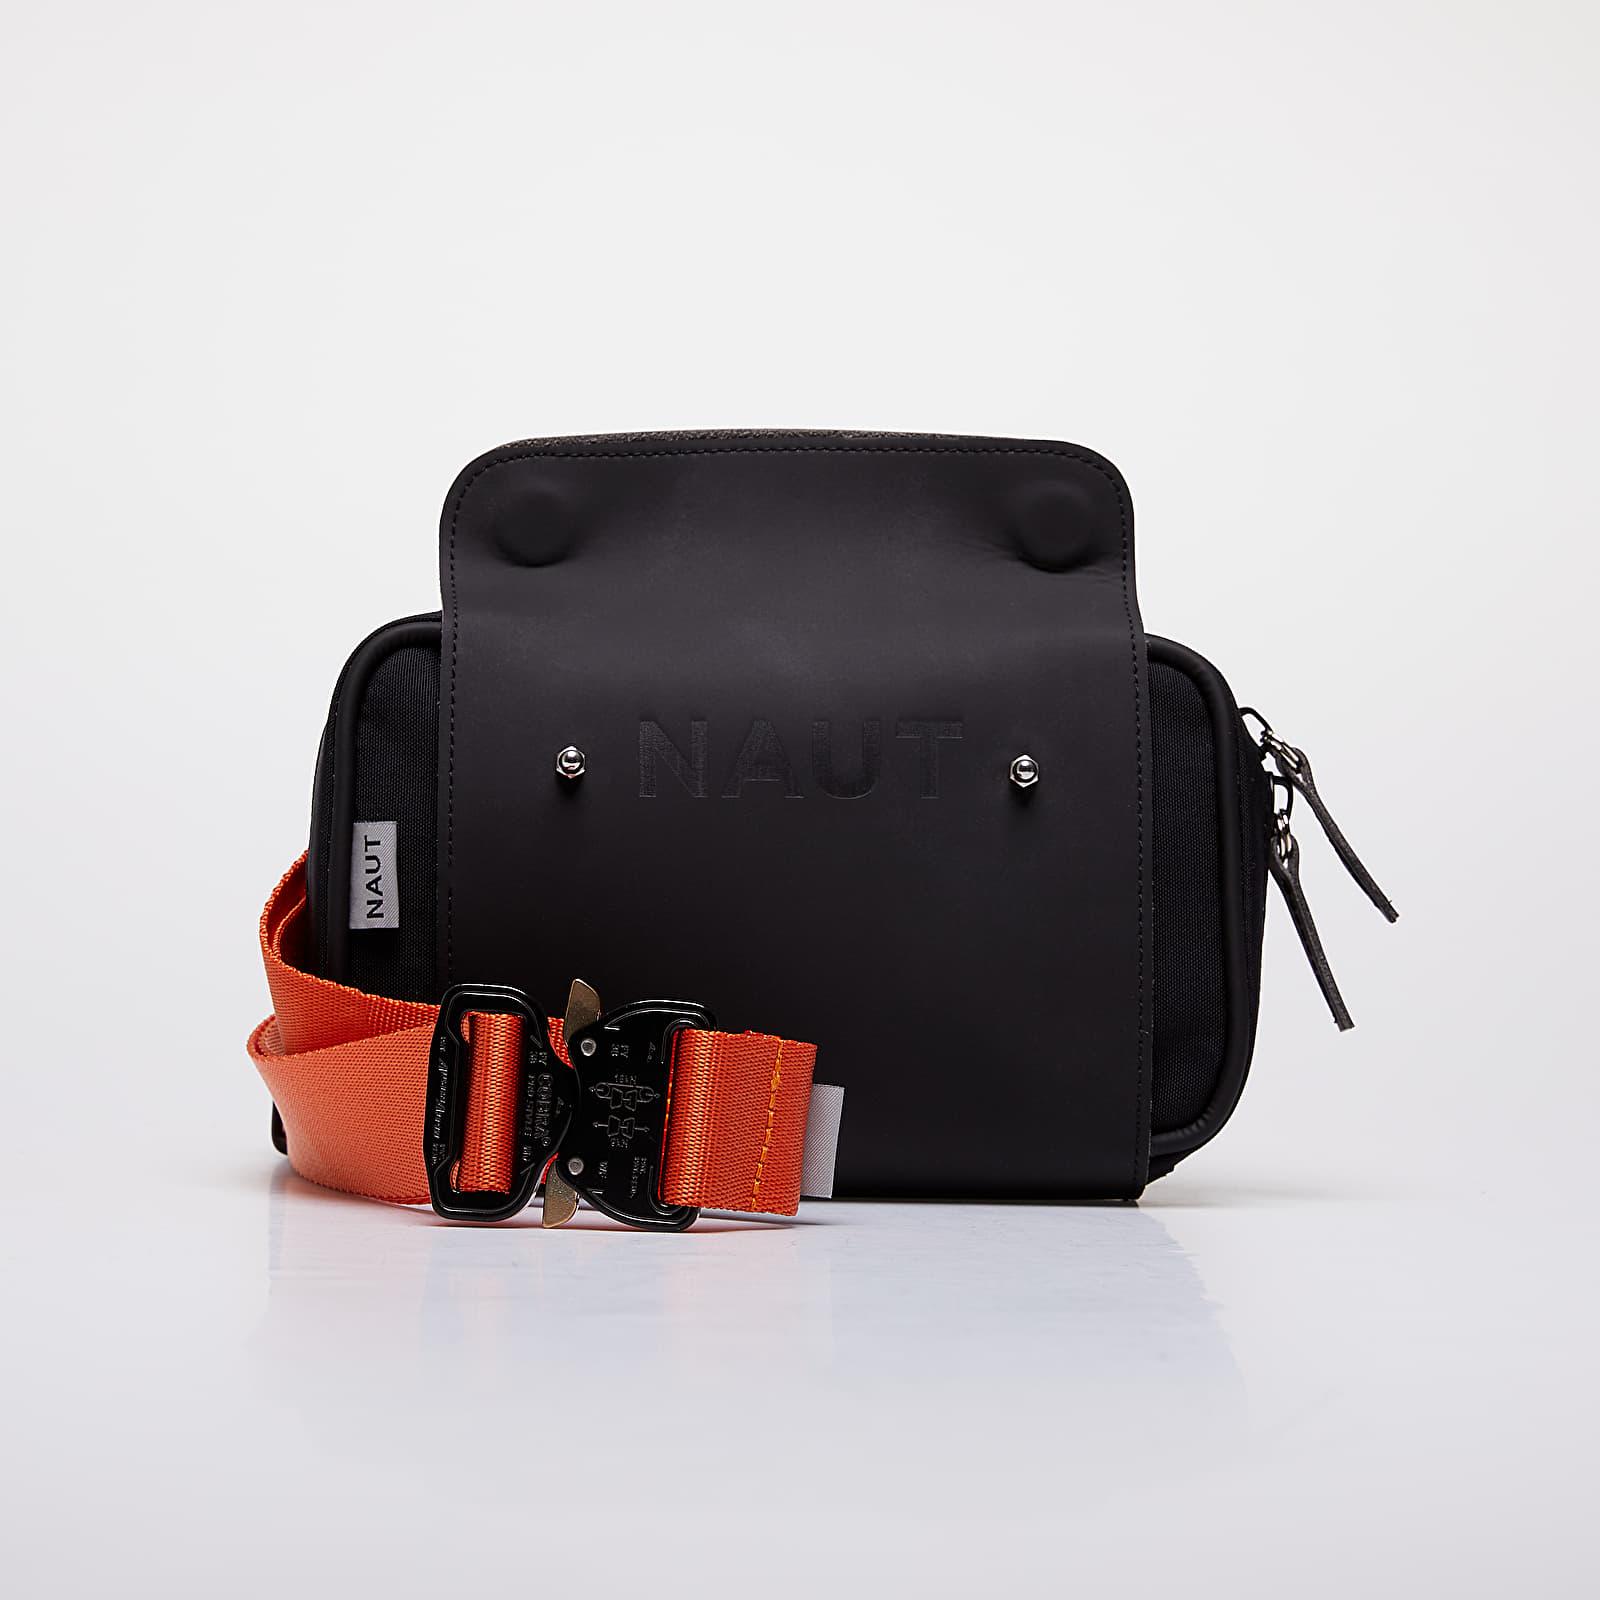 Bags and backpacks NAUT Rudiment Tech Bag Black/ Orange